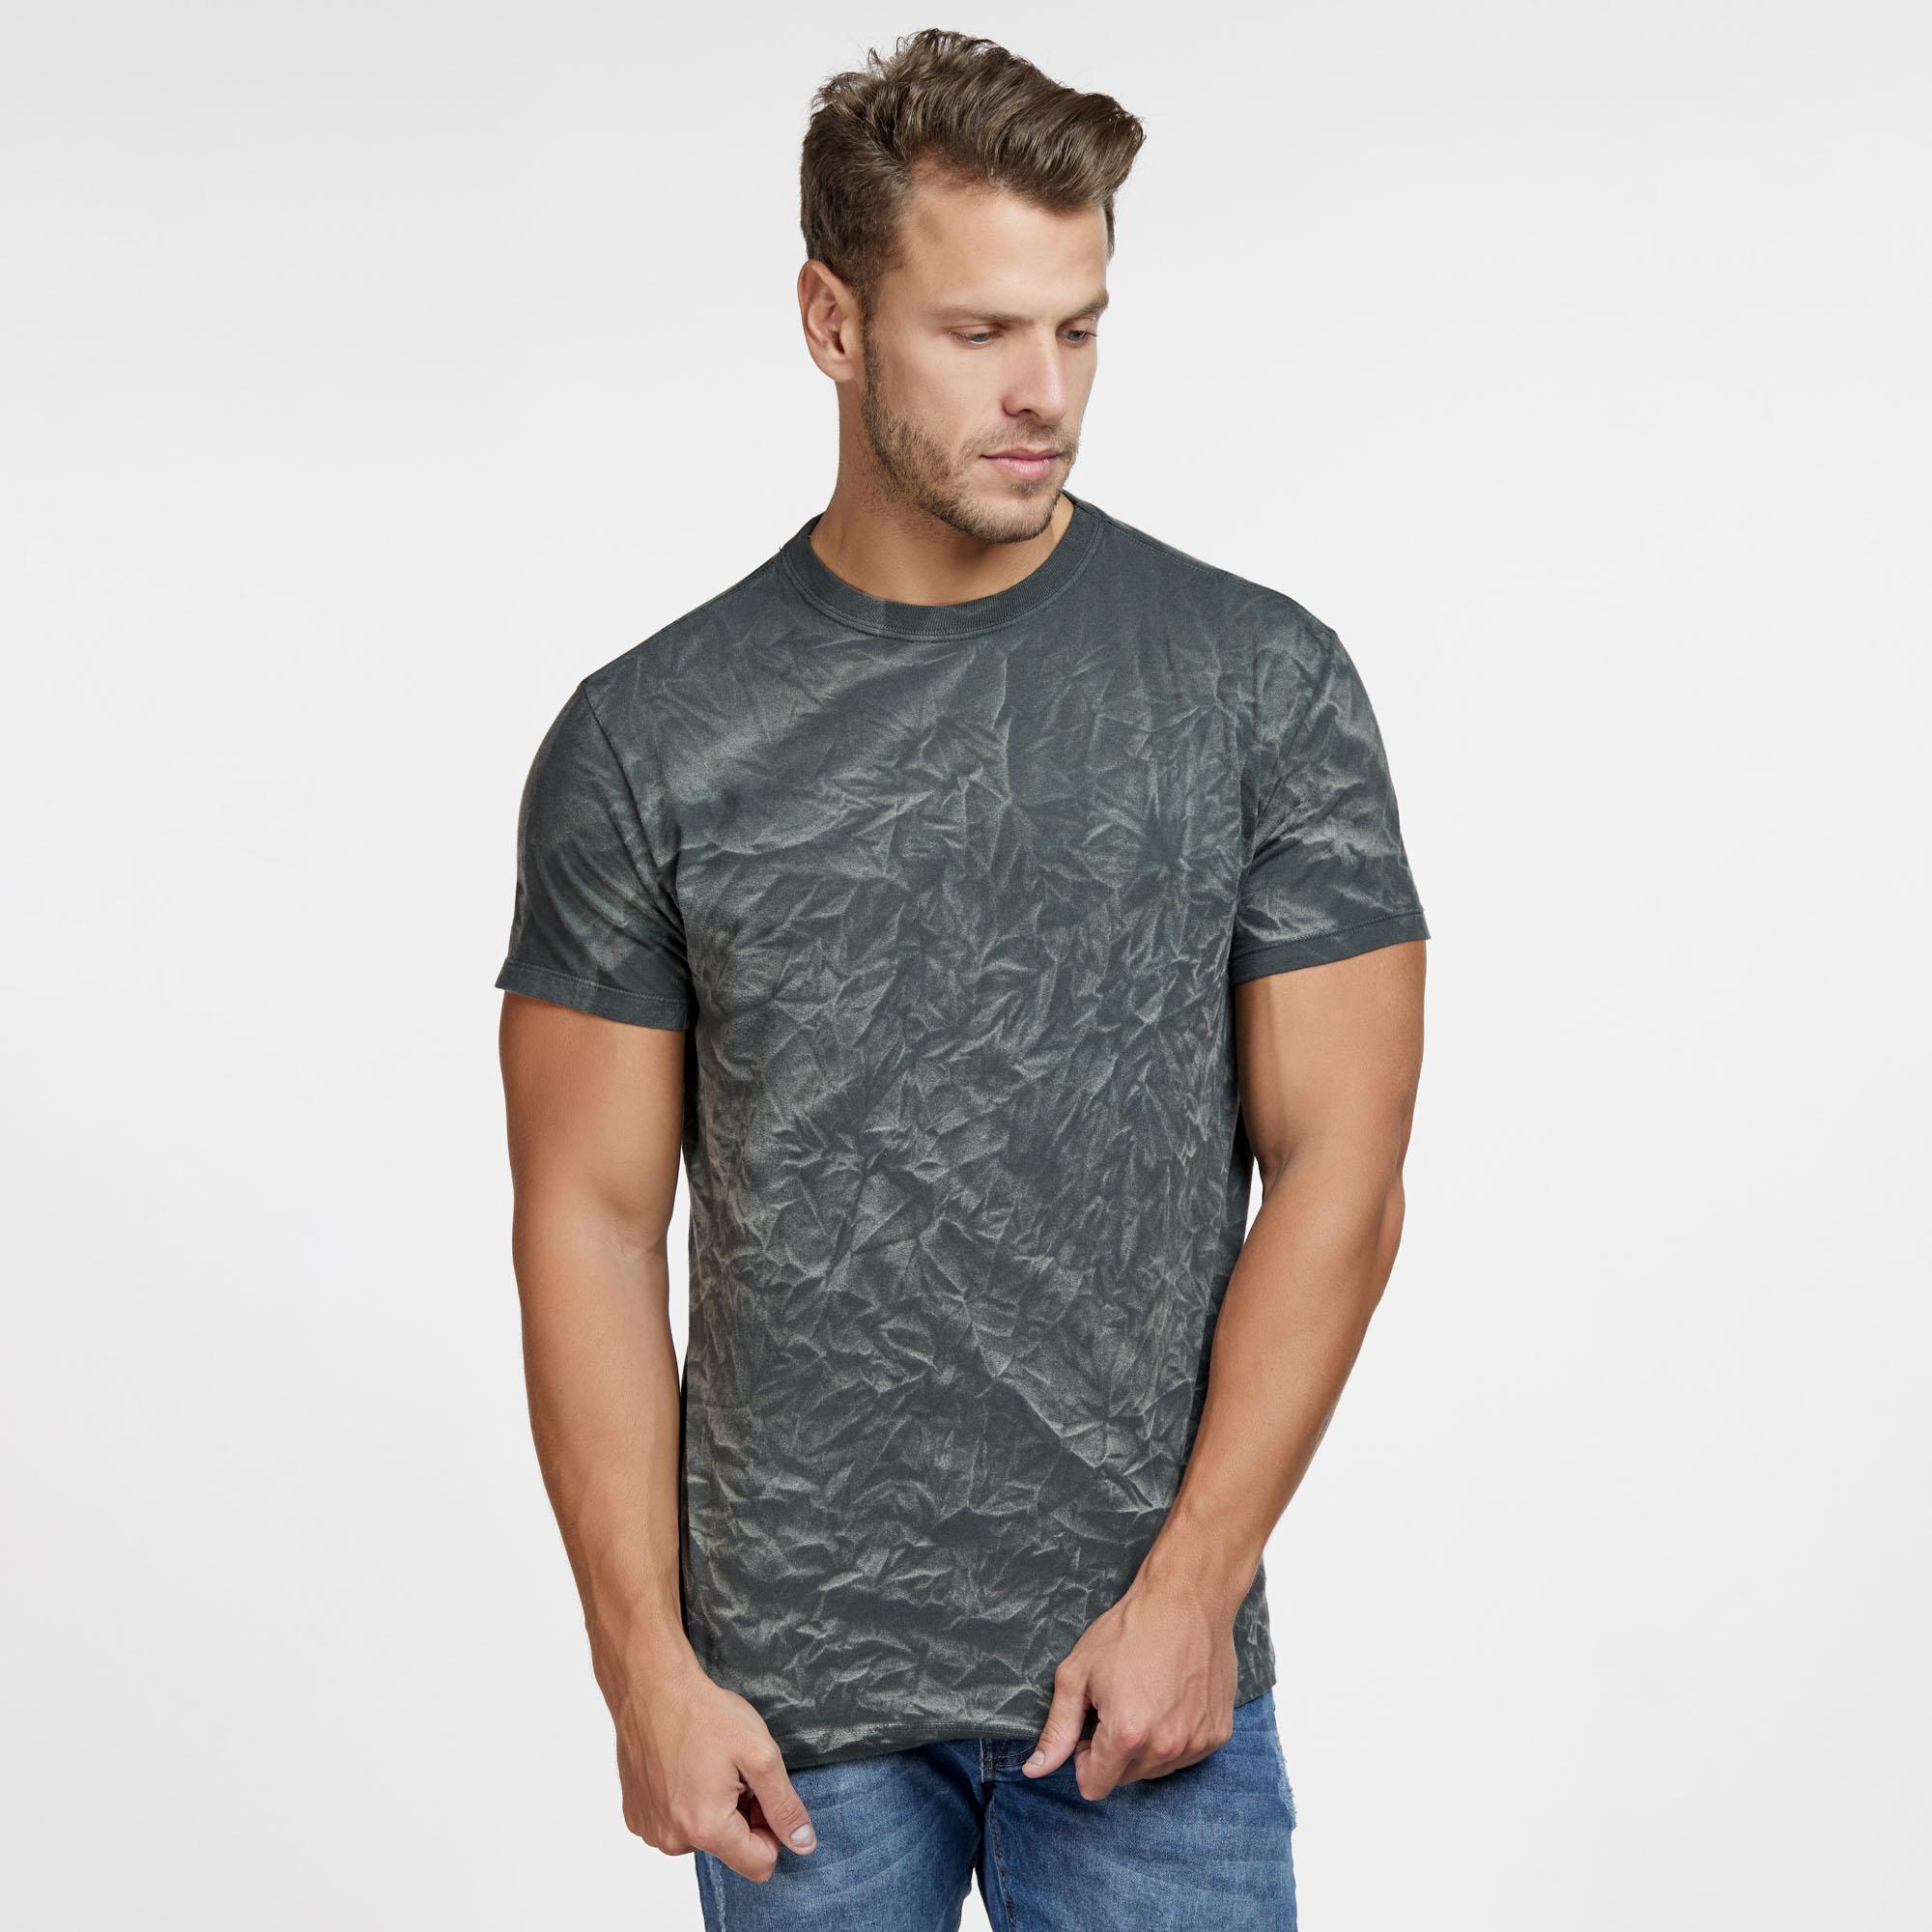 Camiseta Masculina 3D Verde Musgo